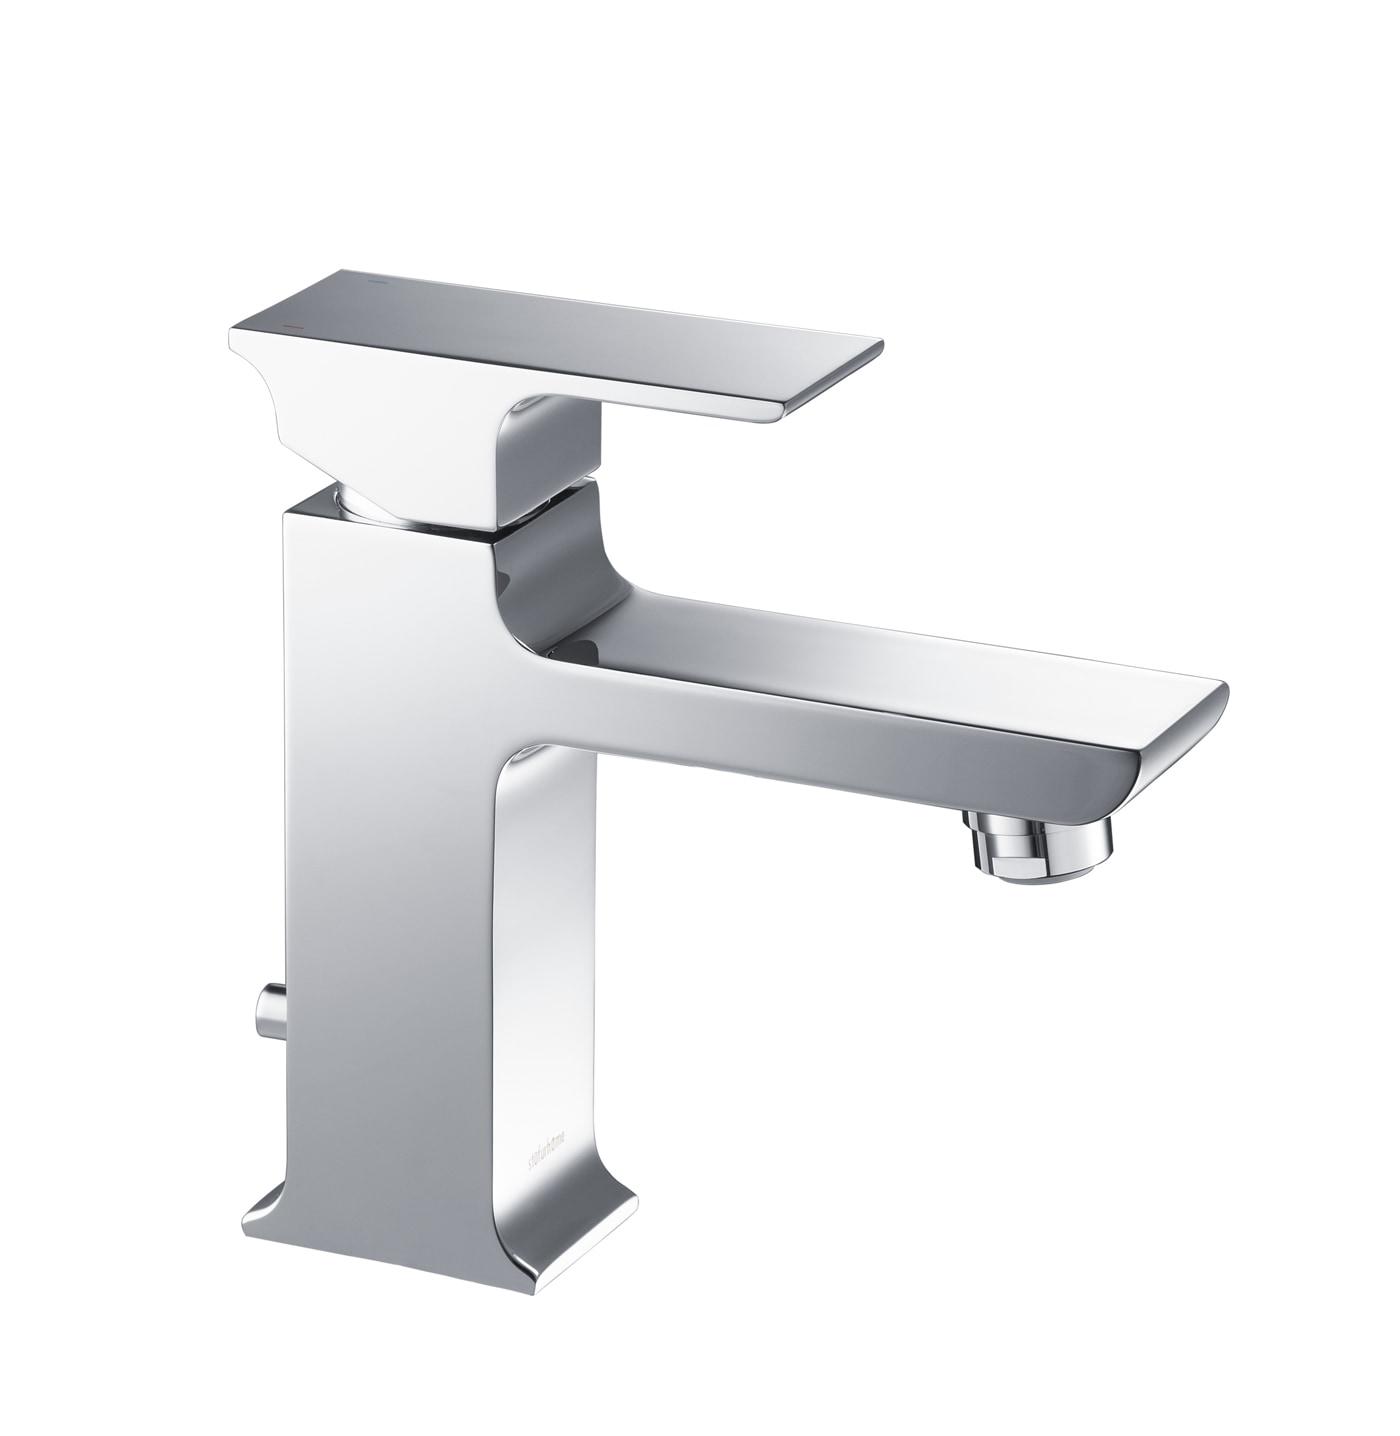 Modern / 1.2 gpm / Single Handle / Chrome / ST1001CH Stufurhome Adler Single Hole Faucet 0